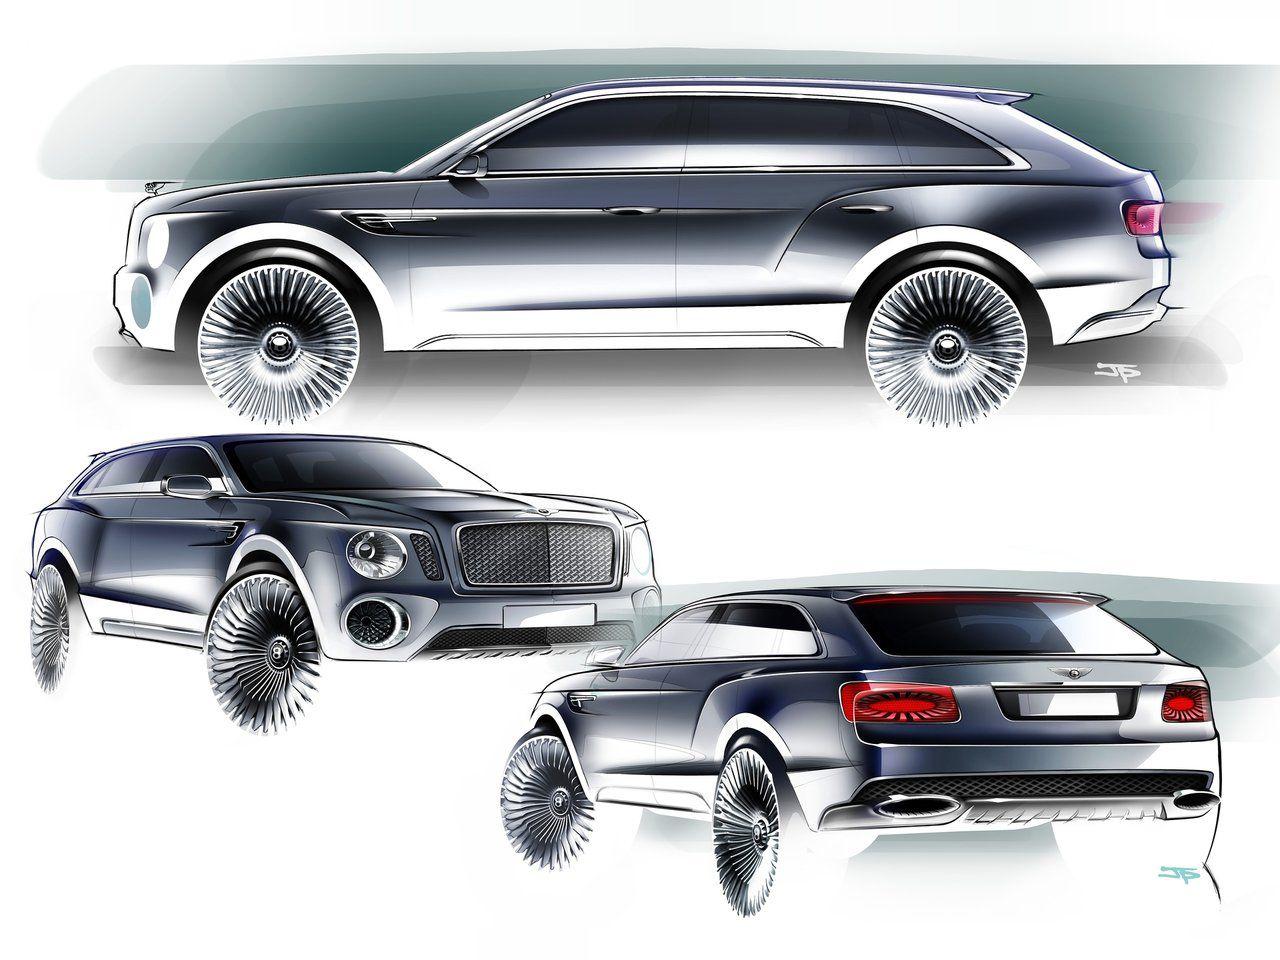 Tutor Ref에 있는 Makoma Mathule님의 핀 2020 자동차 차 스케치 디자인